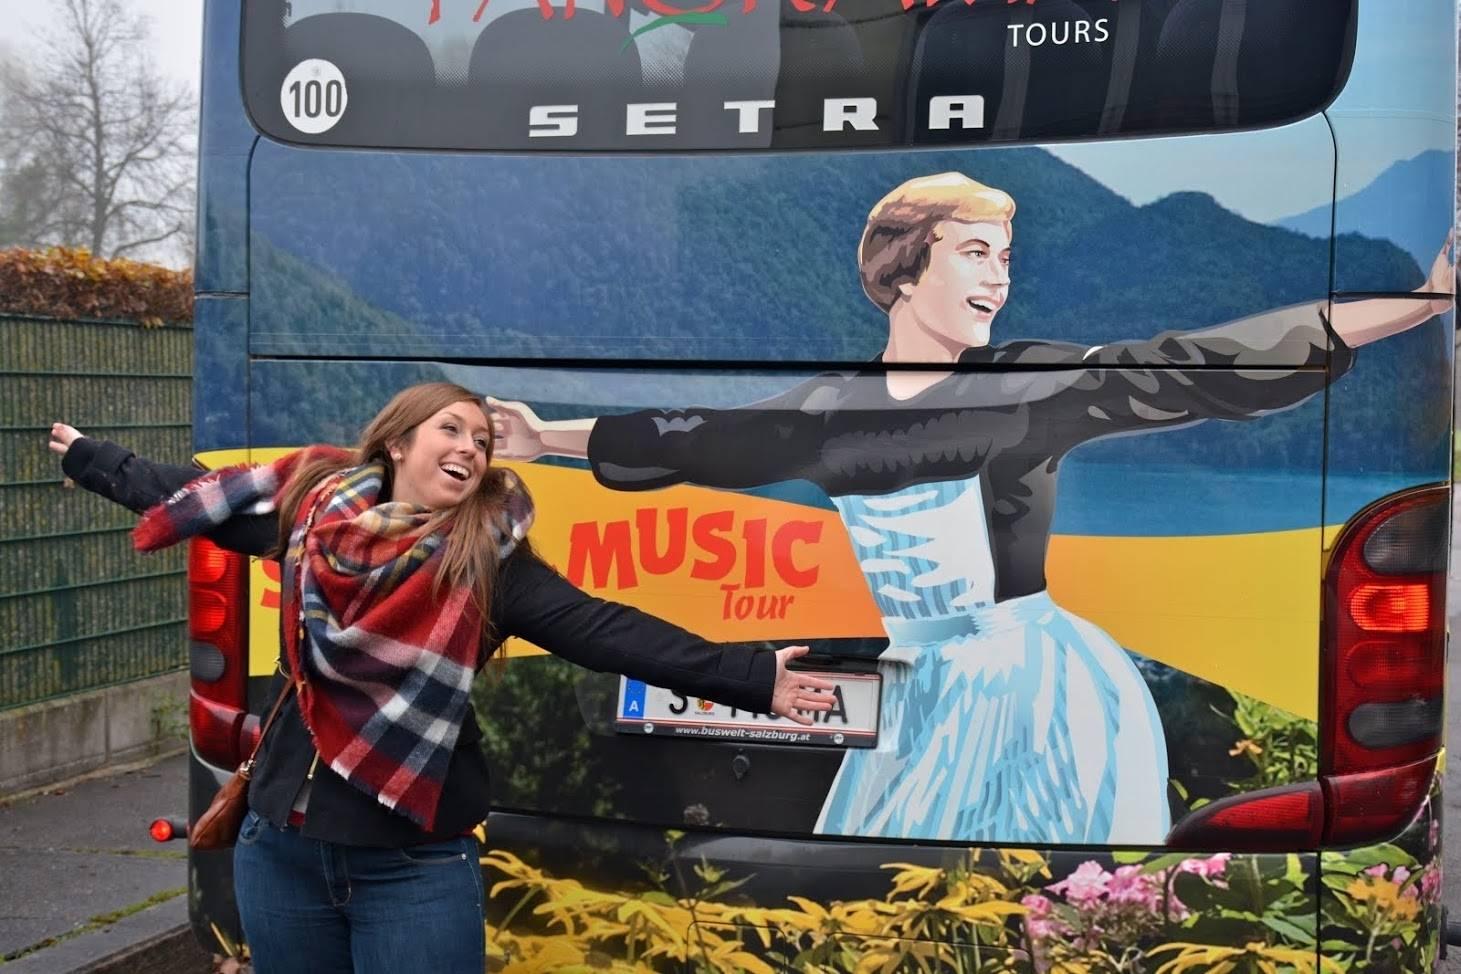 Salzburg Sound Of Music Tour Bus2alps